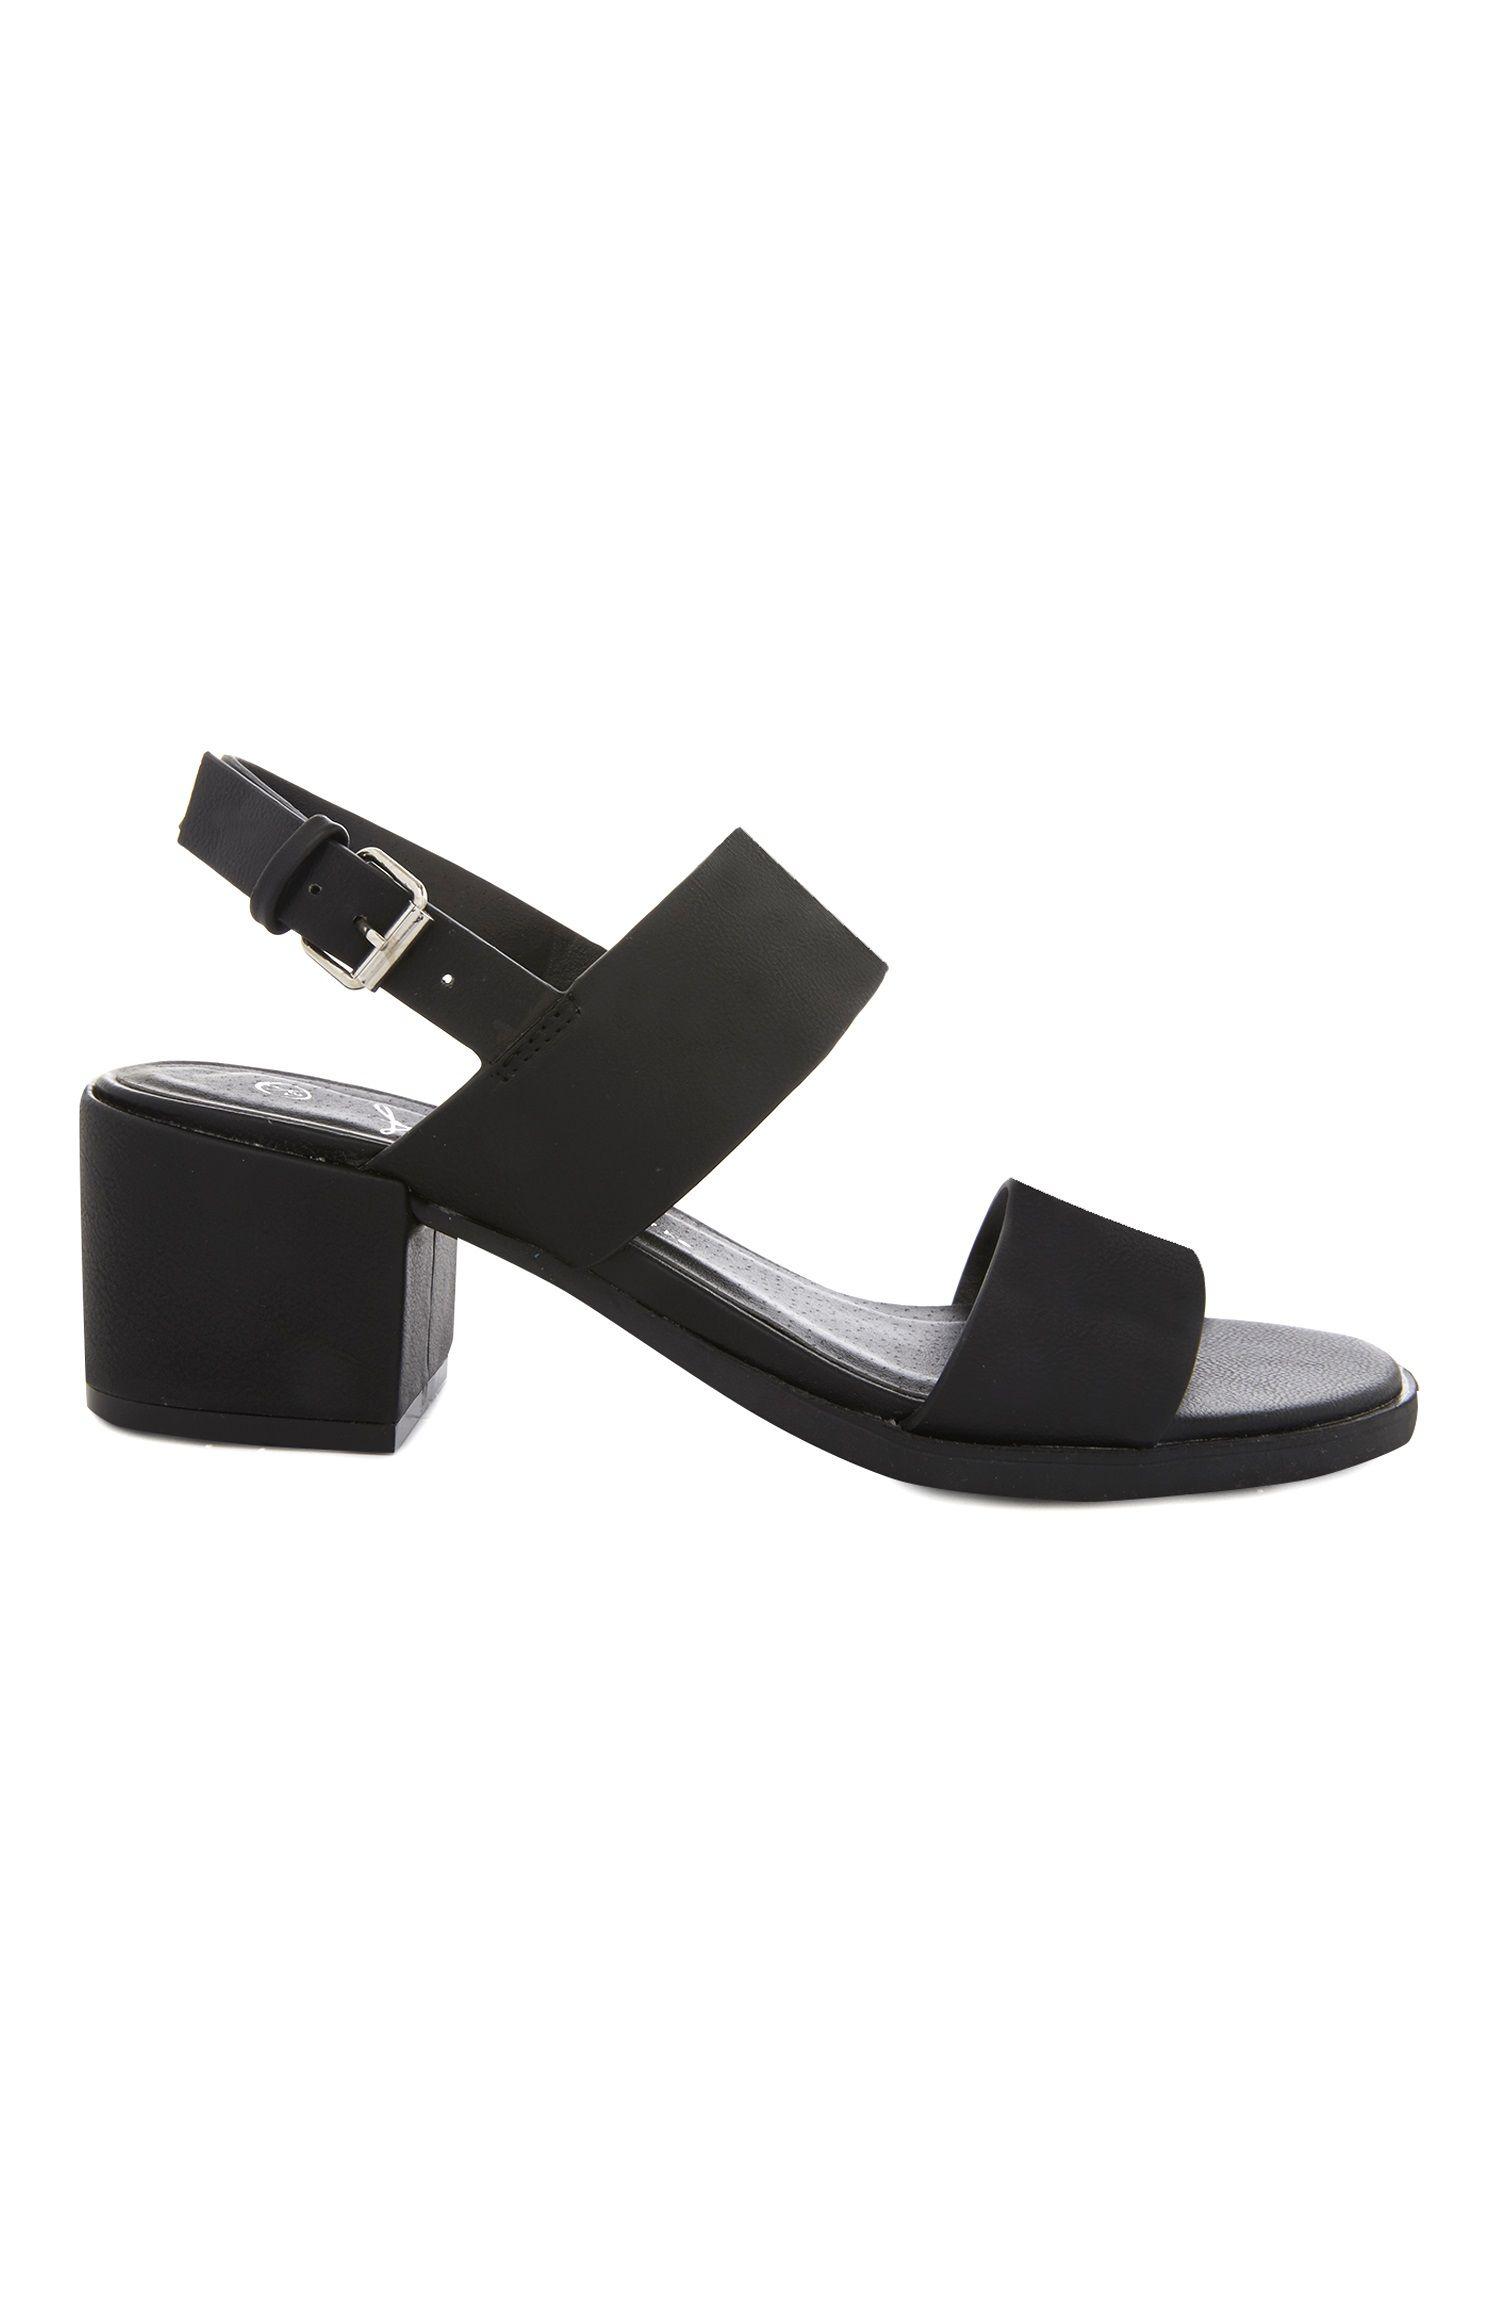 Primark Black Block Heel Sandal   Black